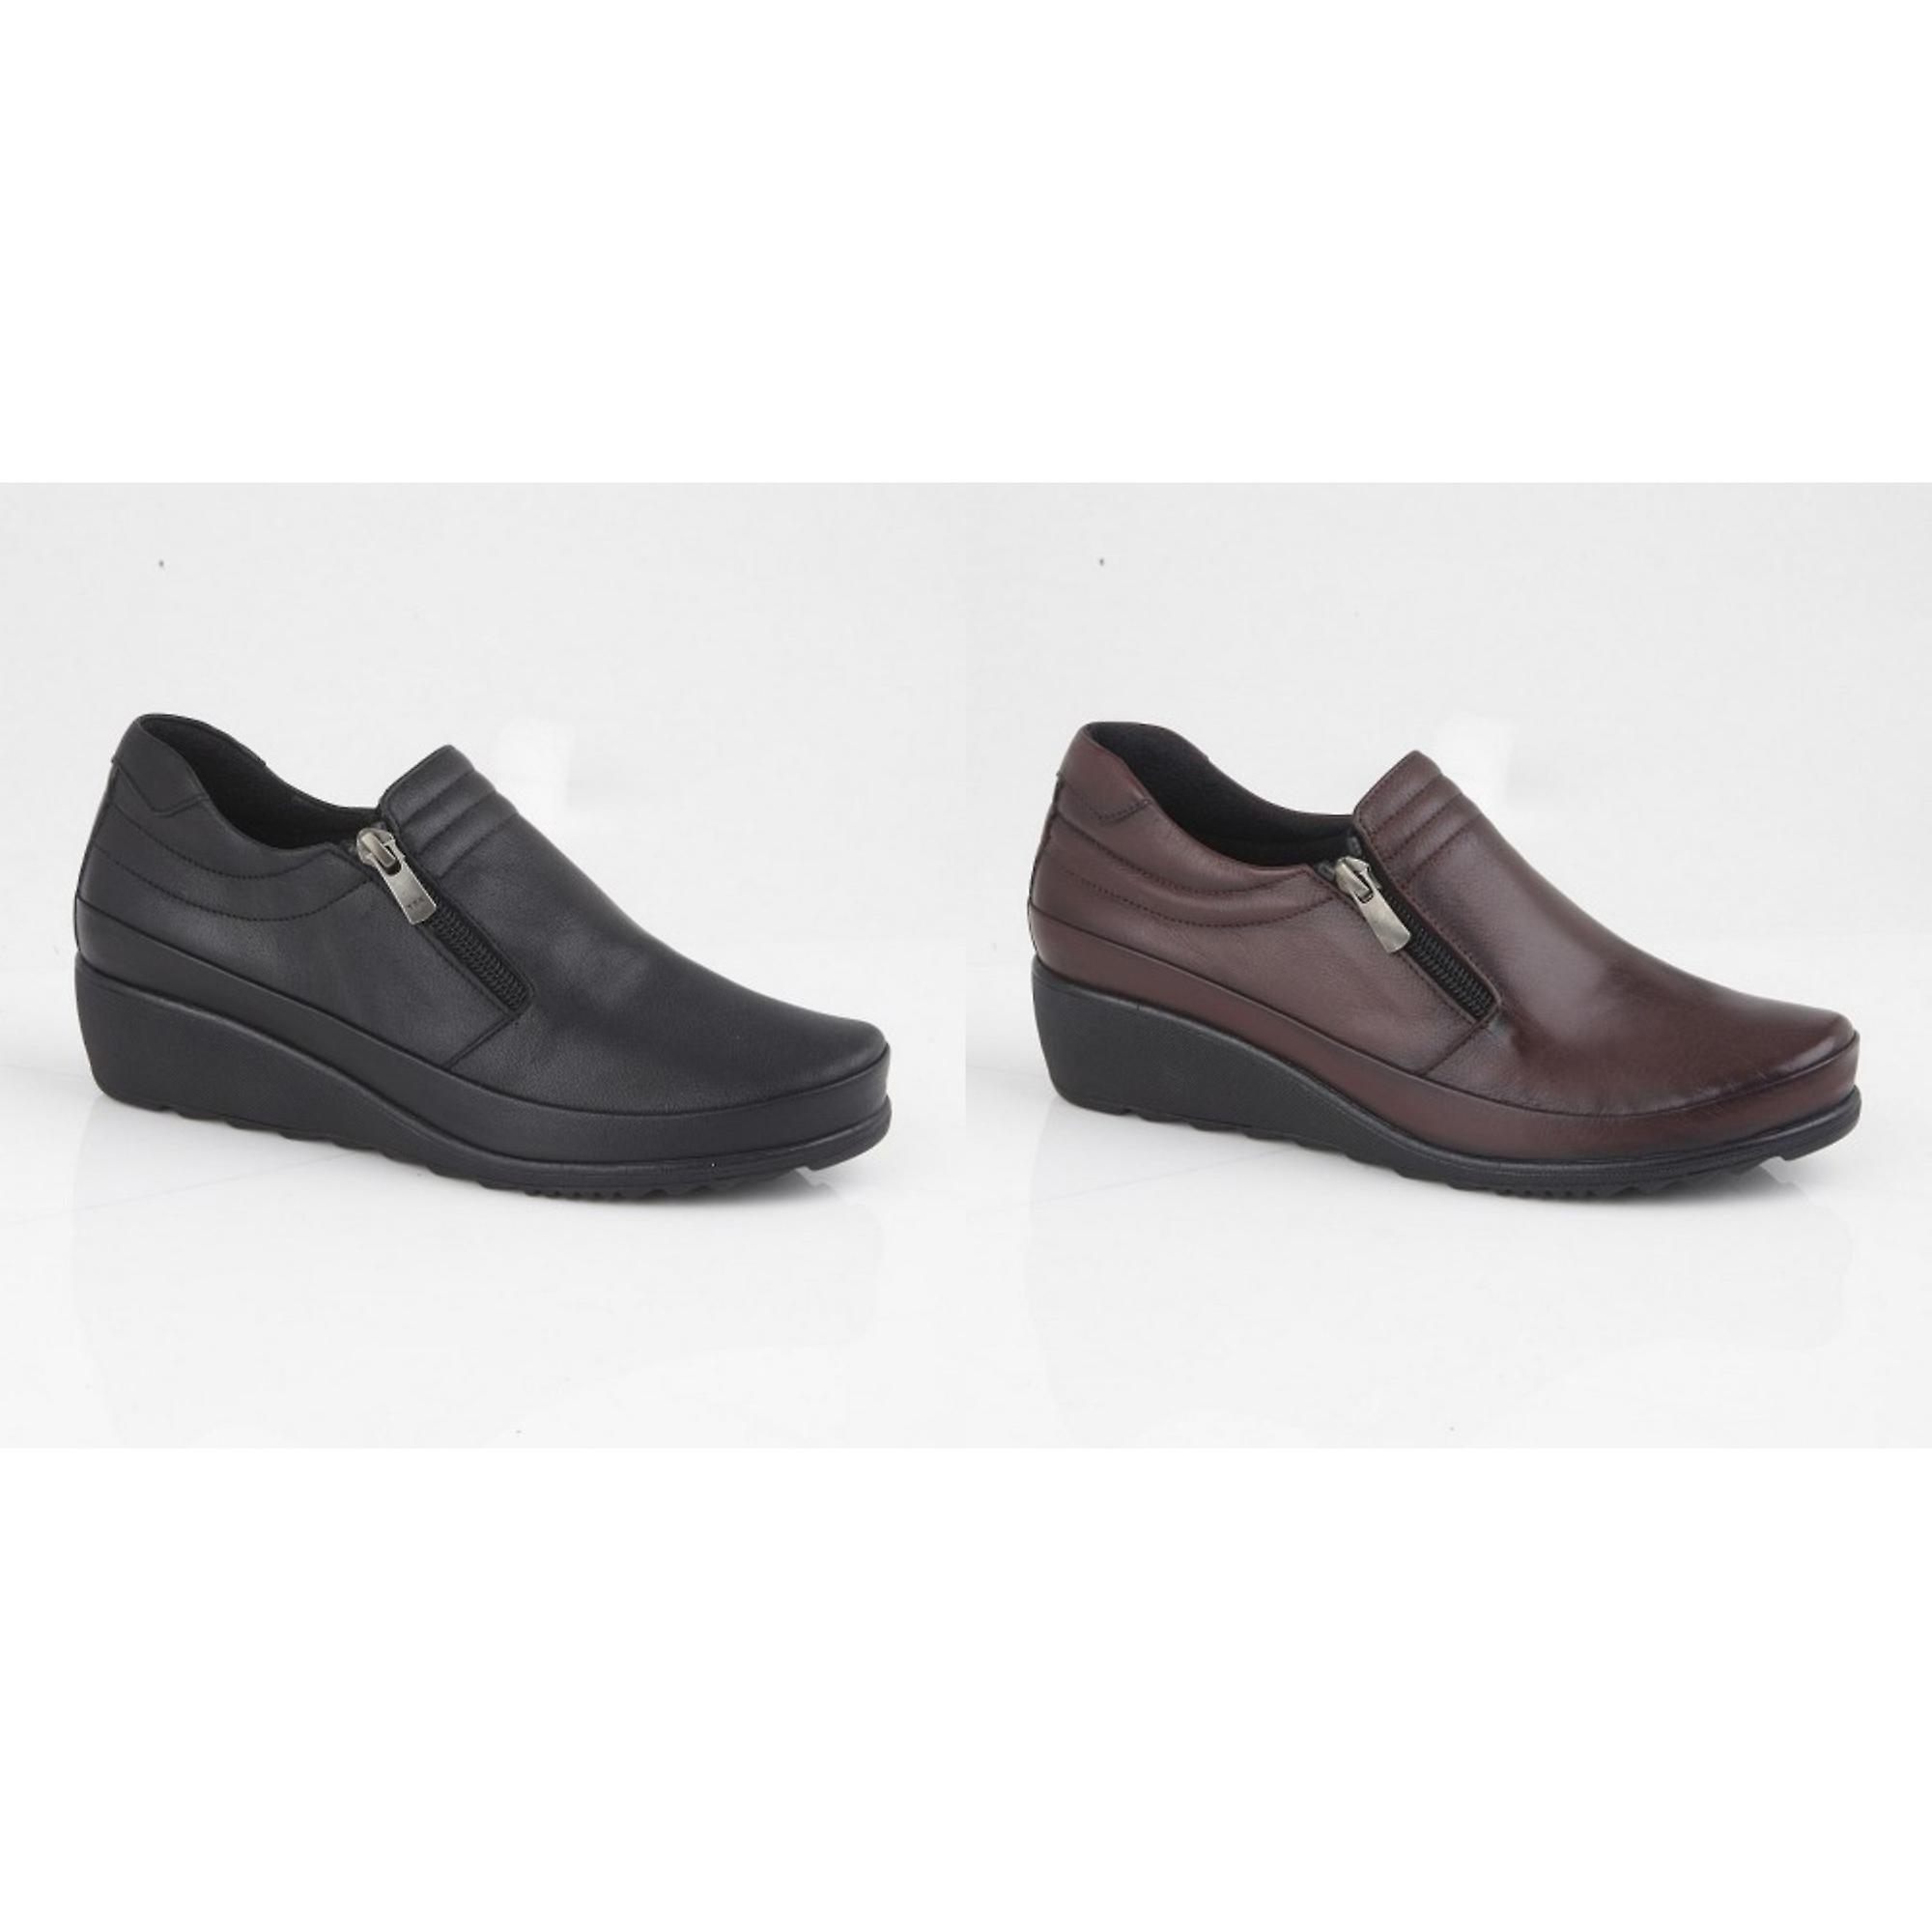 Mod Comfys Womens/Ladies Zipped Gusset Casual Leather Shoe pJM3d